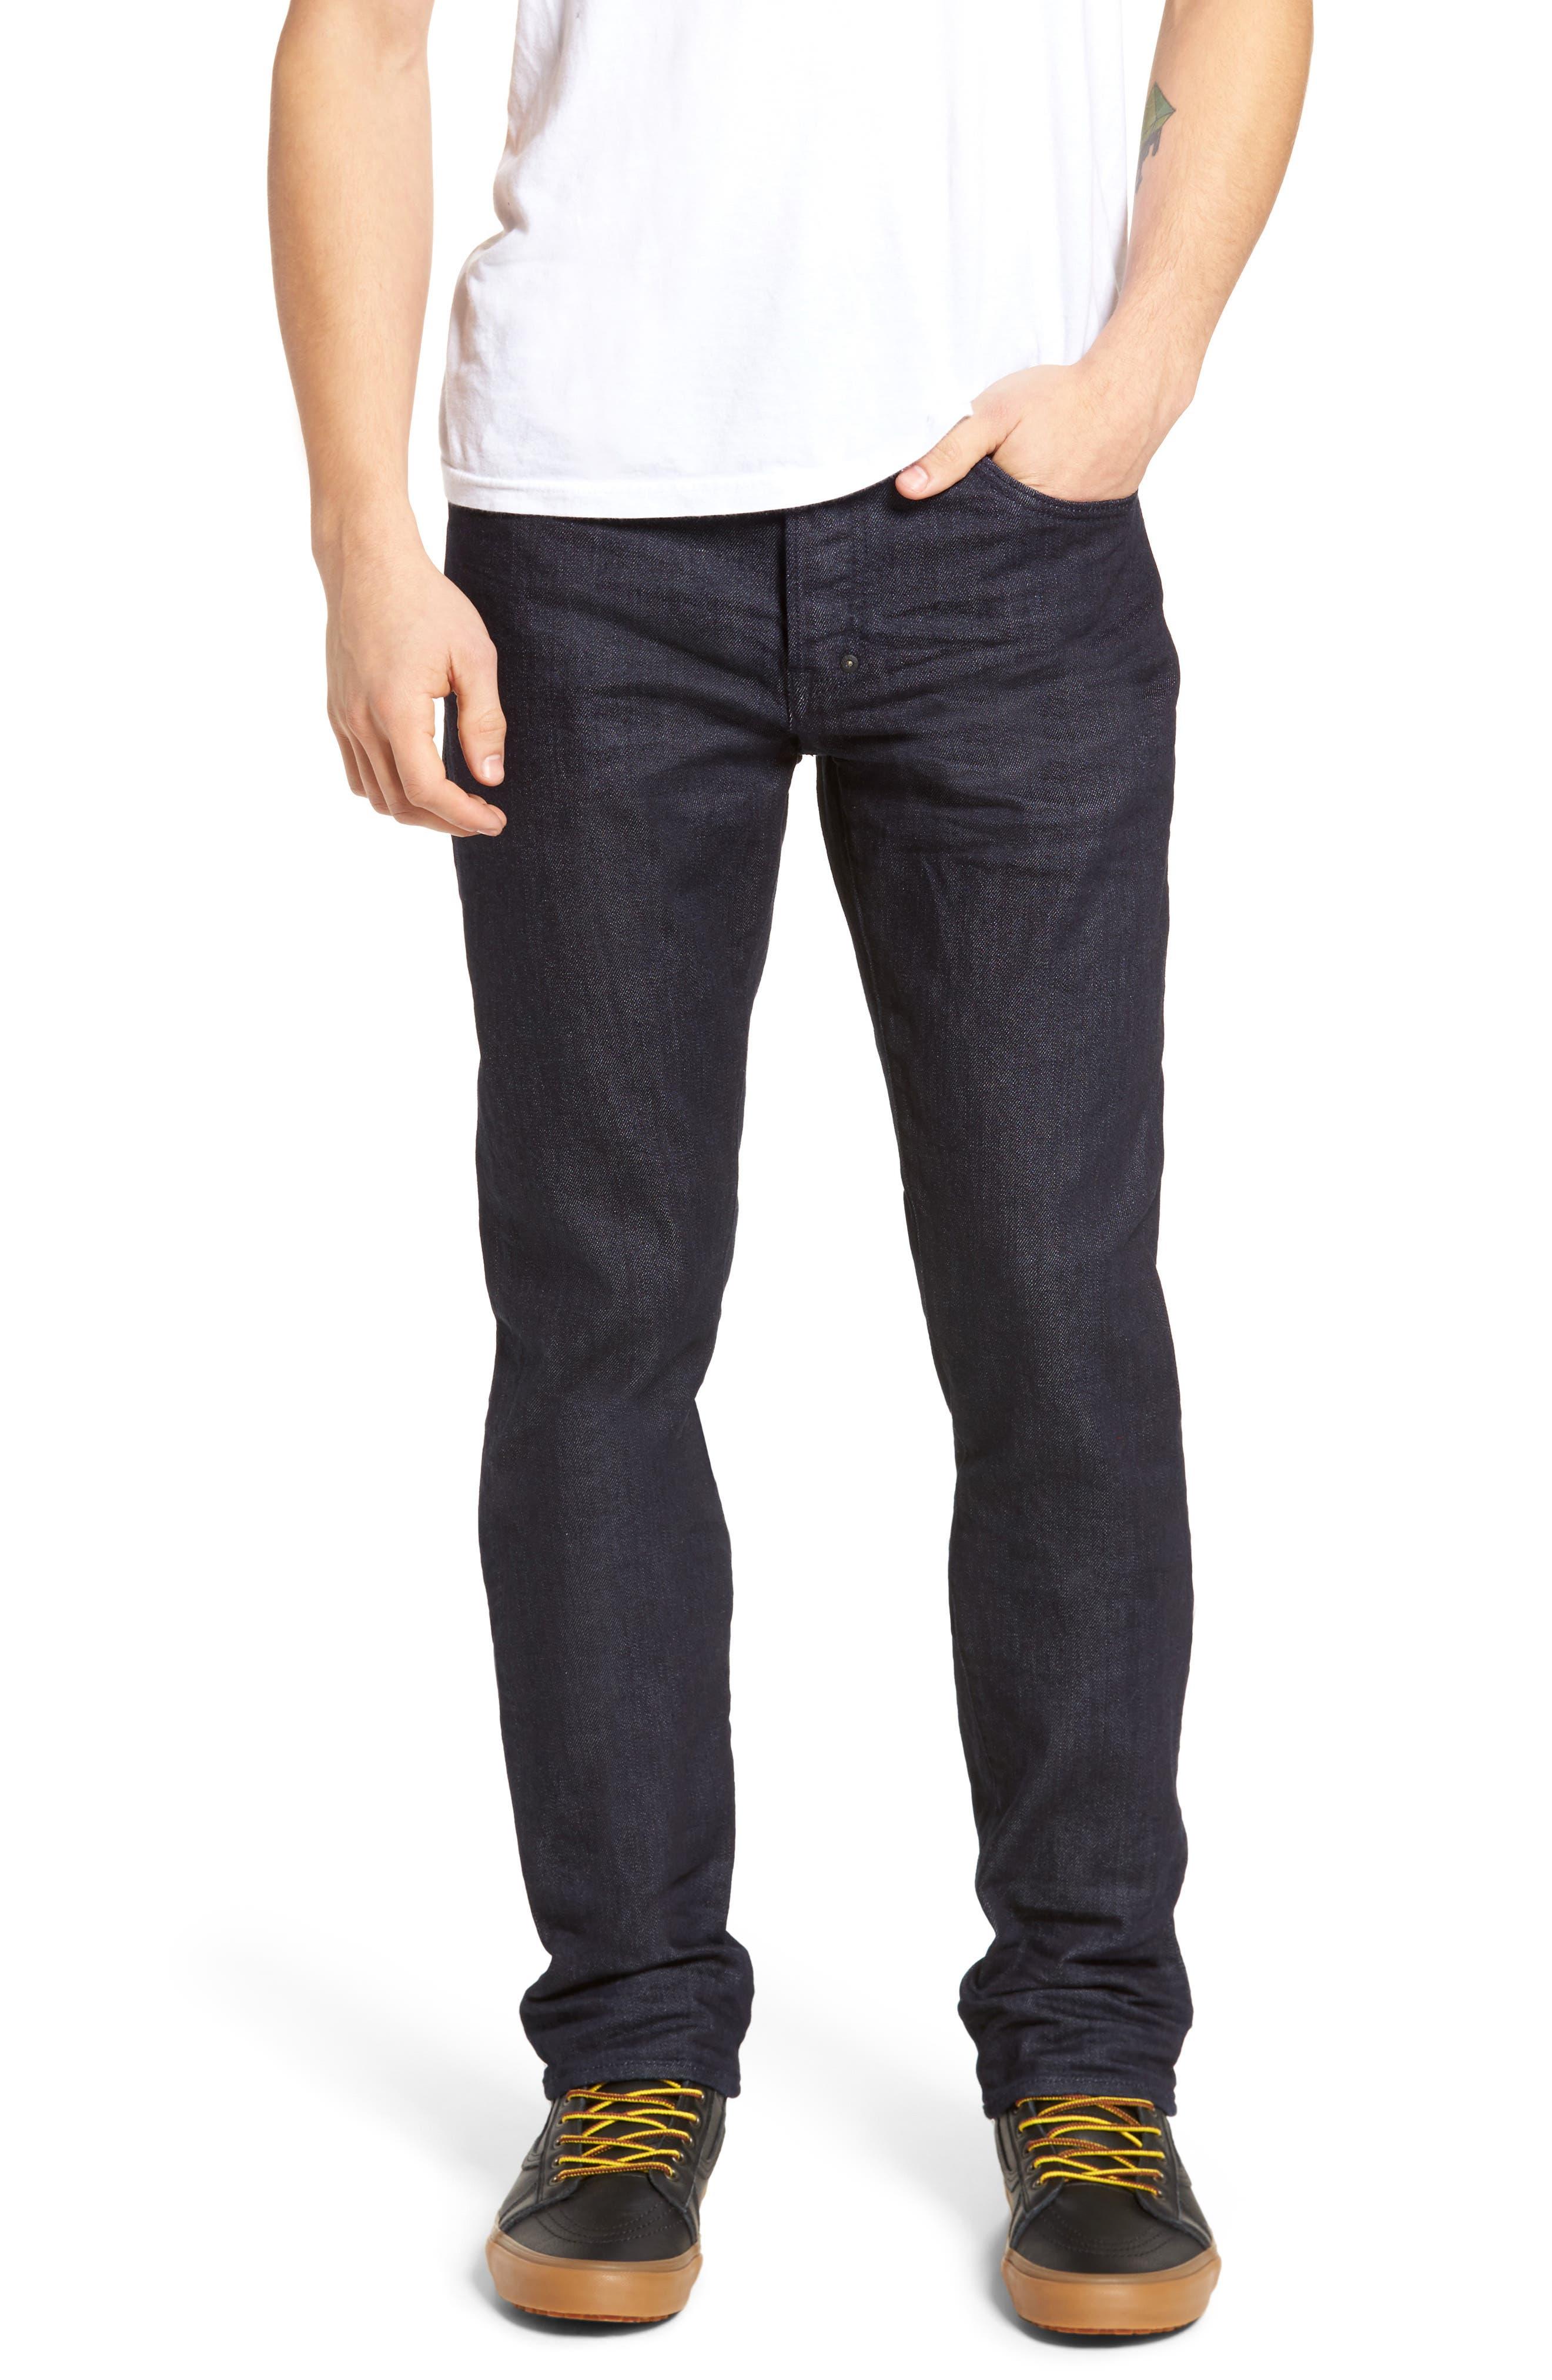 Demon Slim Straight Leg Jeans,                             Main thumbnail 1, color,                             Rinse